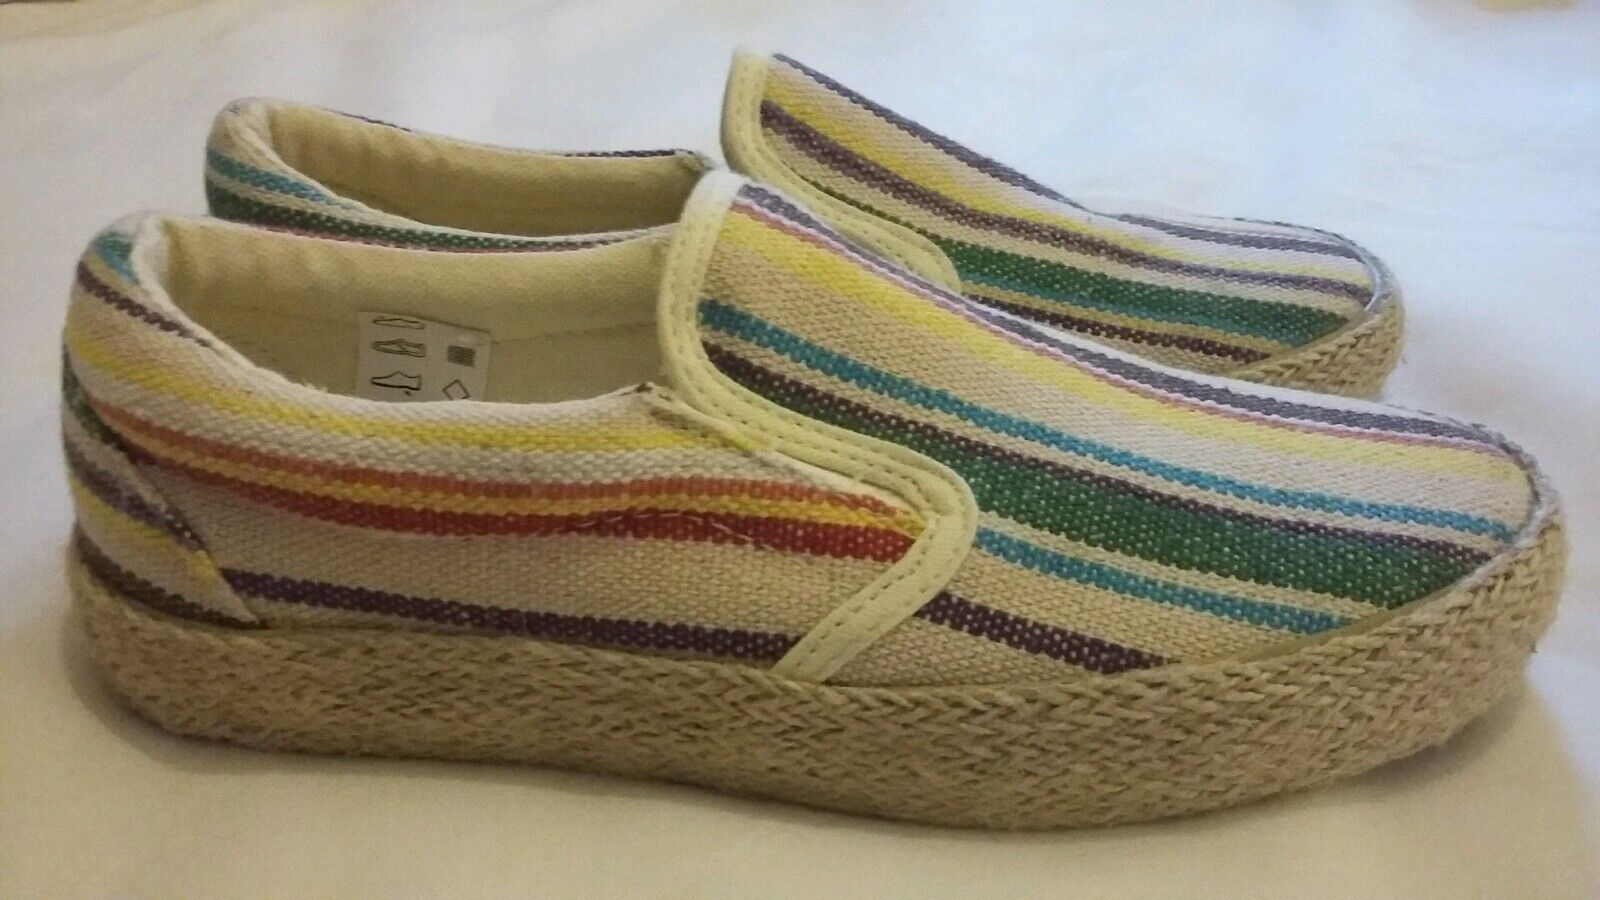 MANOUSH Espadrilles Slip-on Sneakers Größe uk 5 eu 38